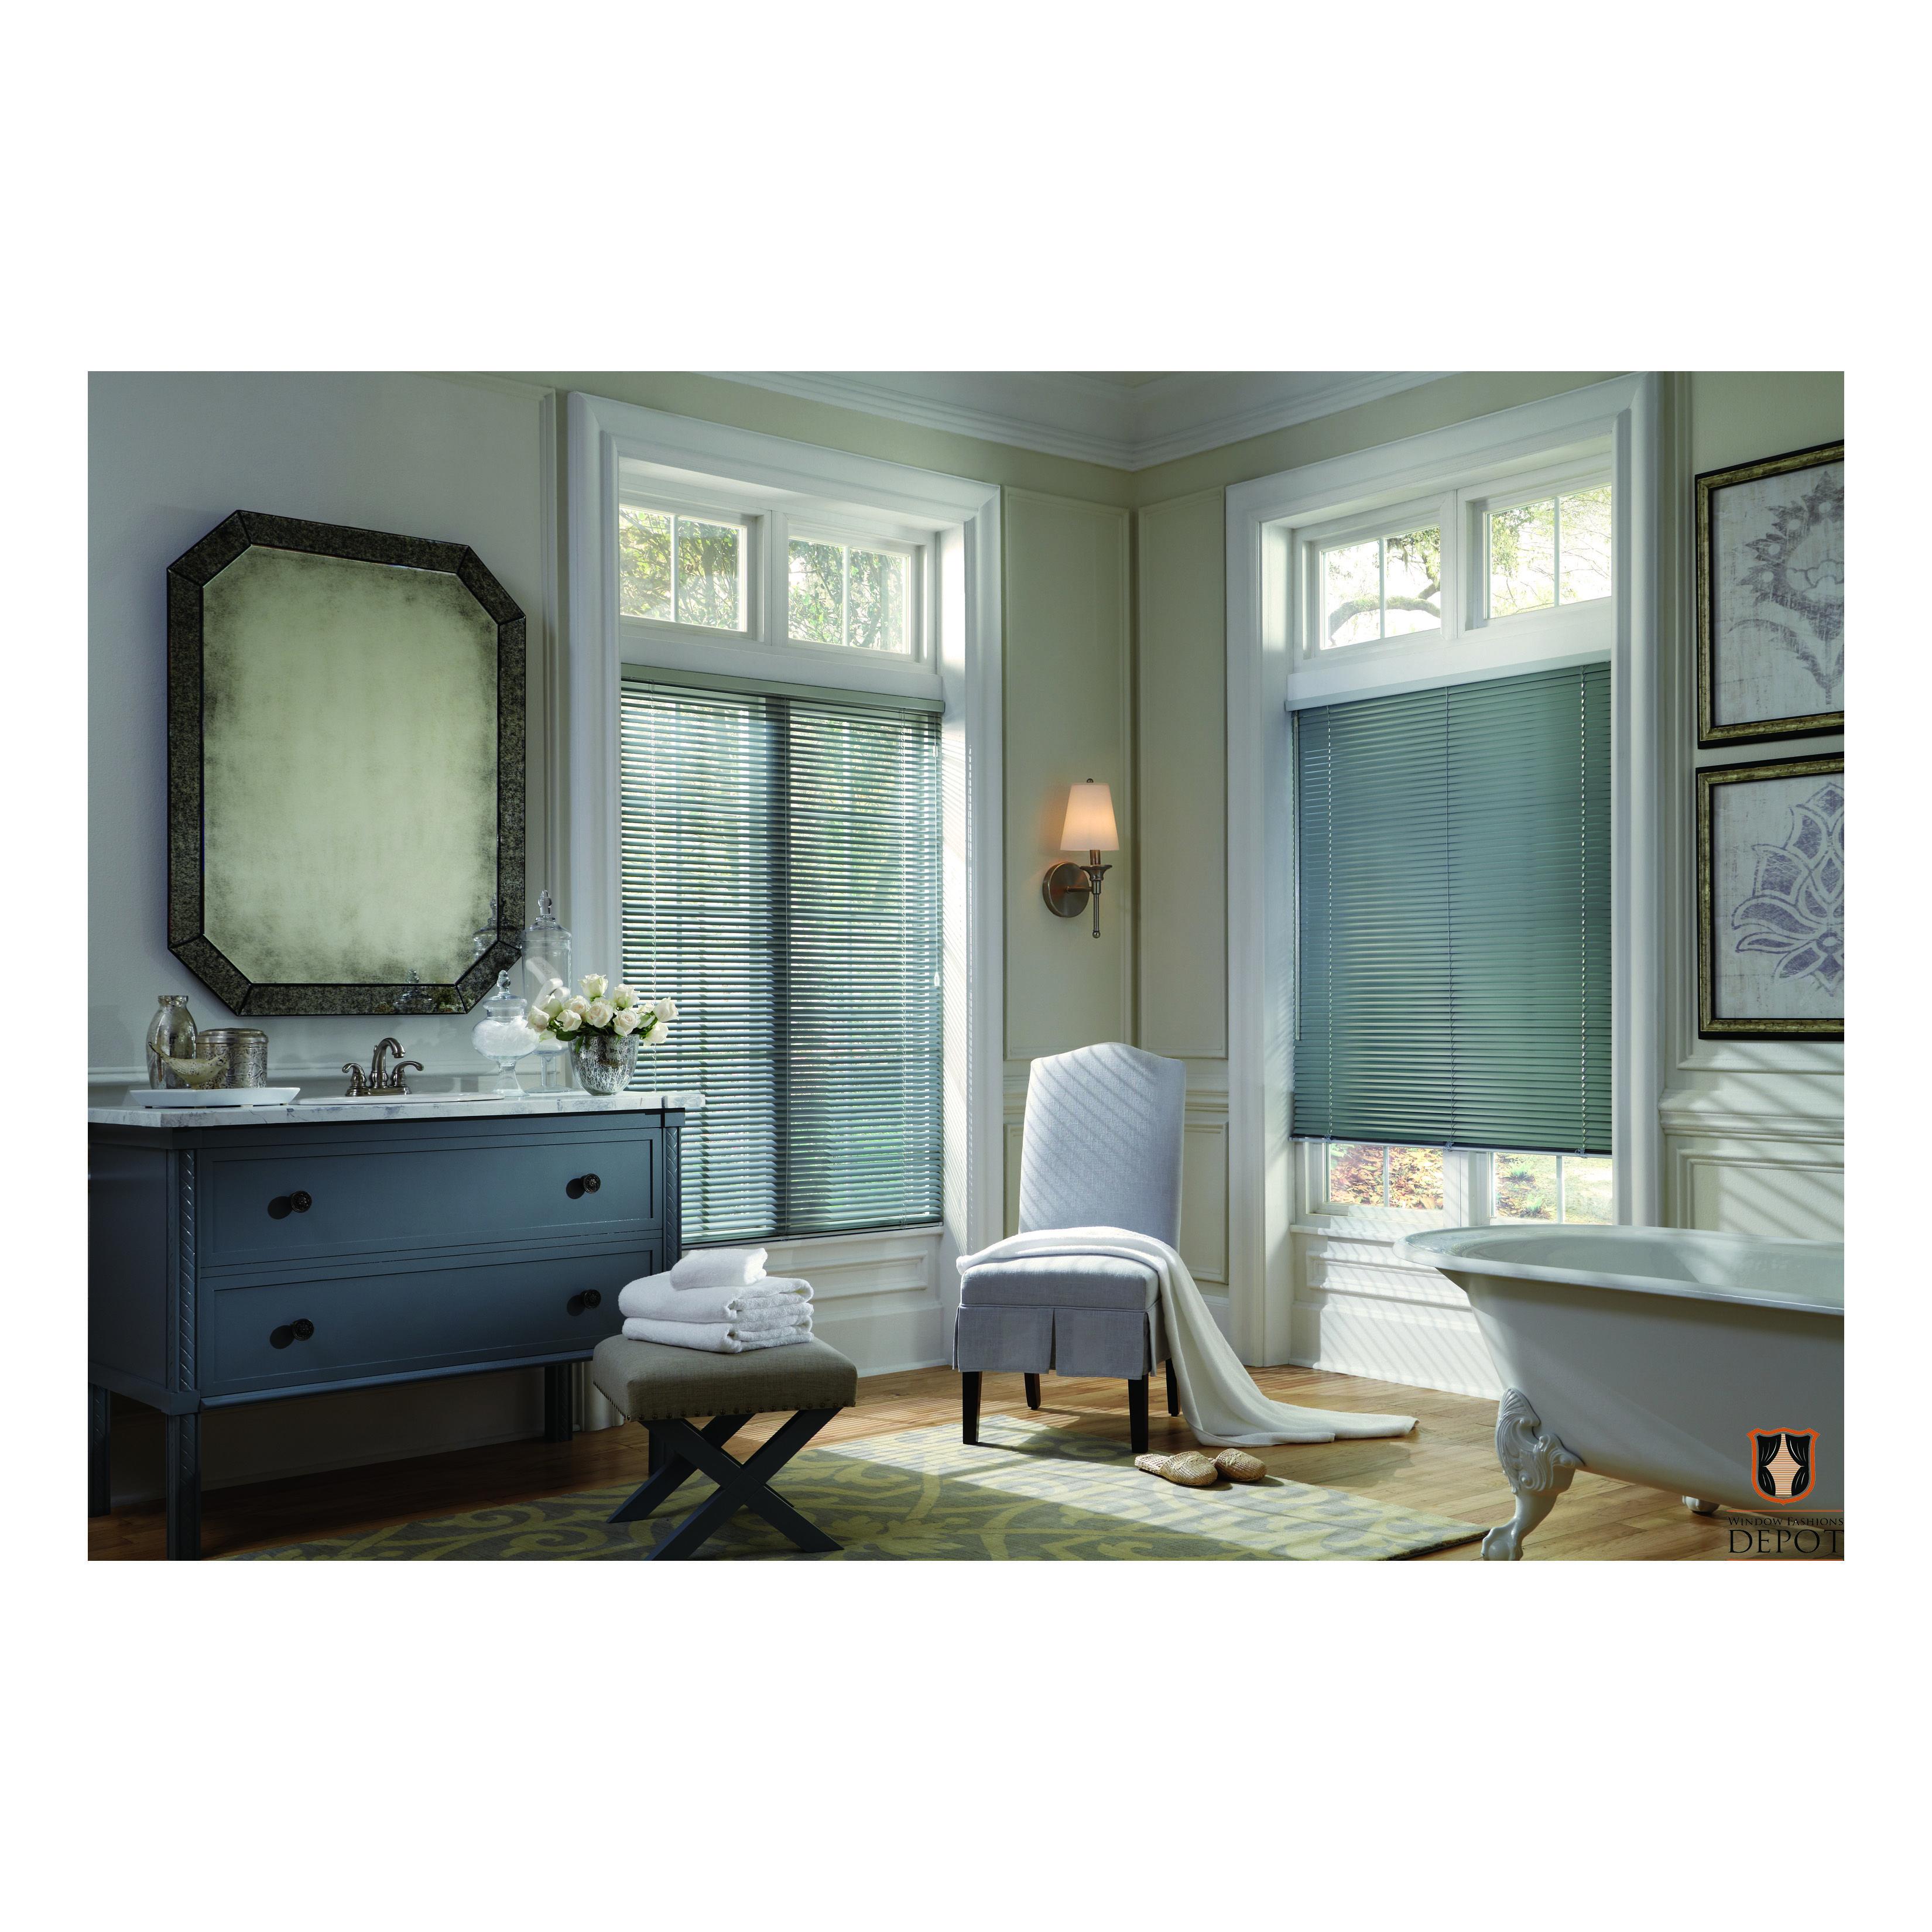 Window Treatments Interiordesign: Horizontal Blinds For Bathroom